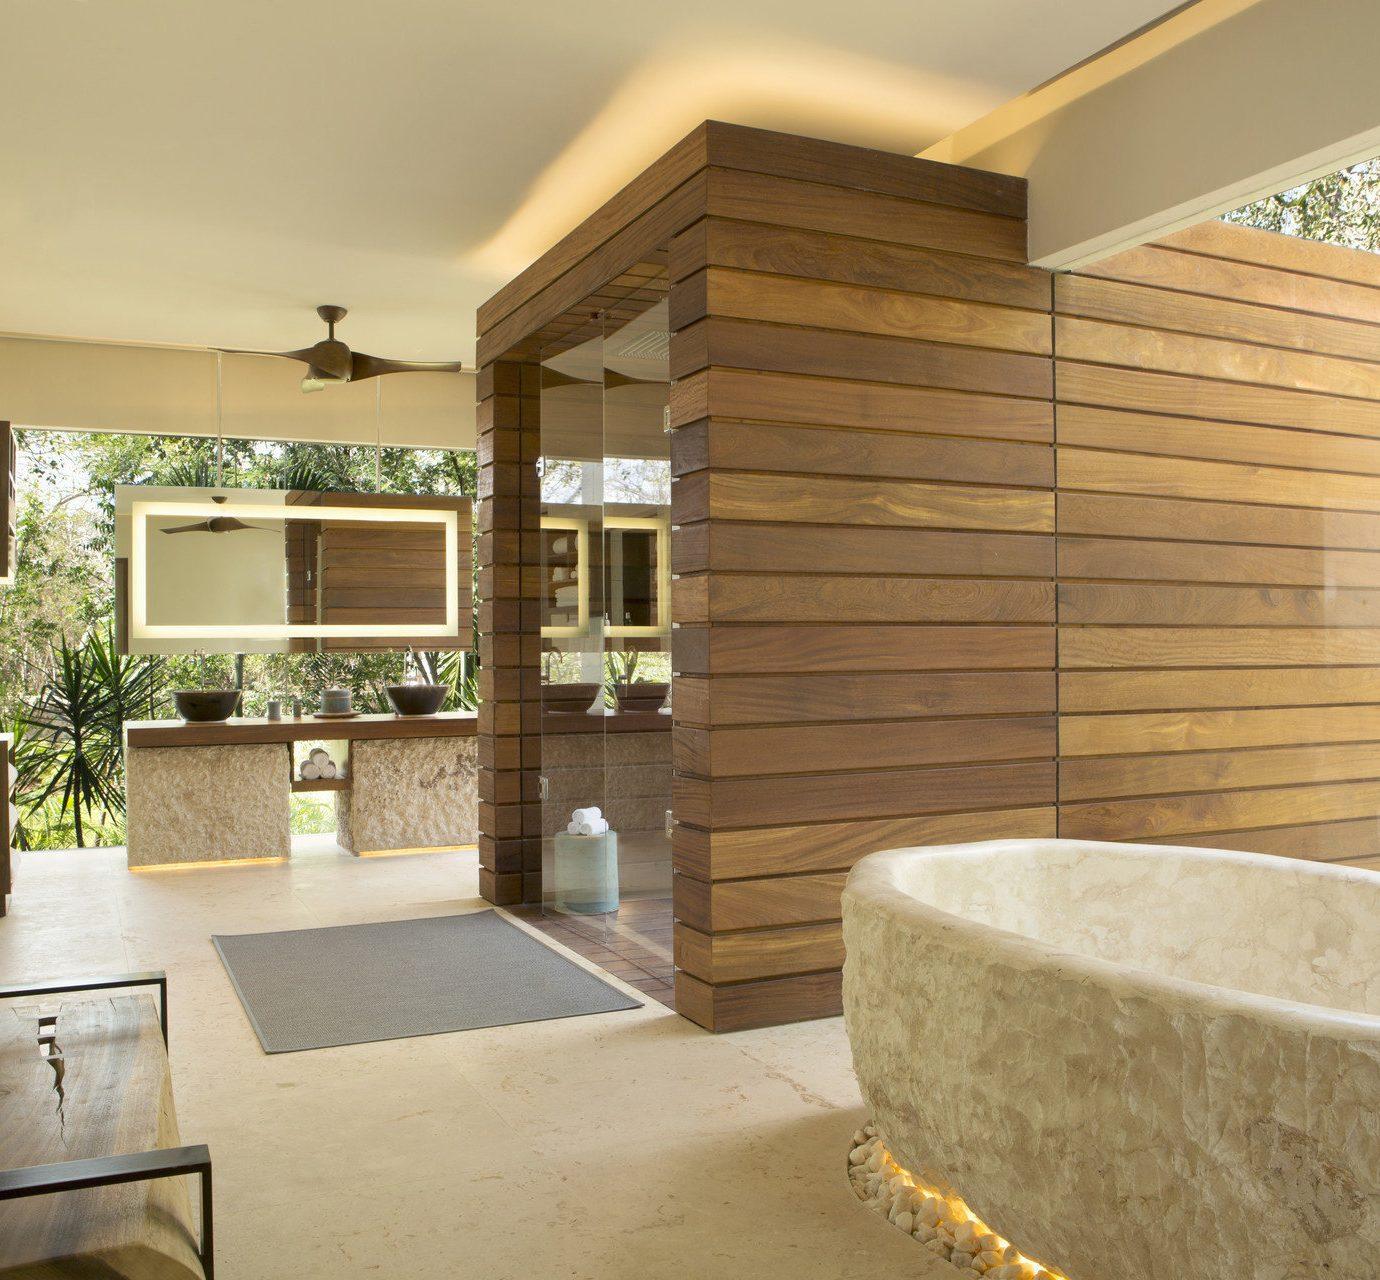 property building home house cottage living room farmhouse porch tub stone bathroom